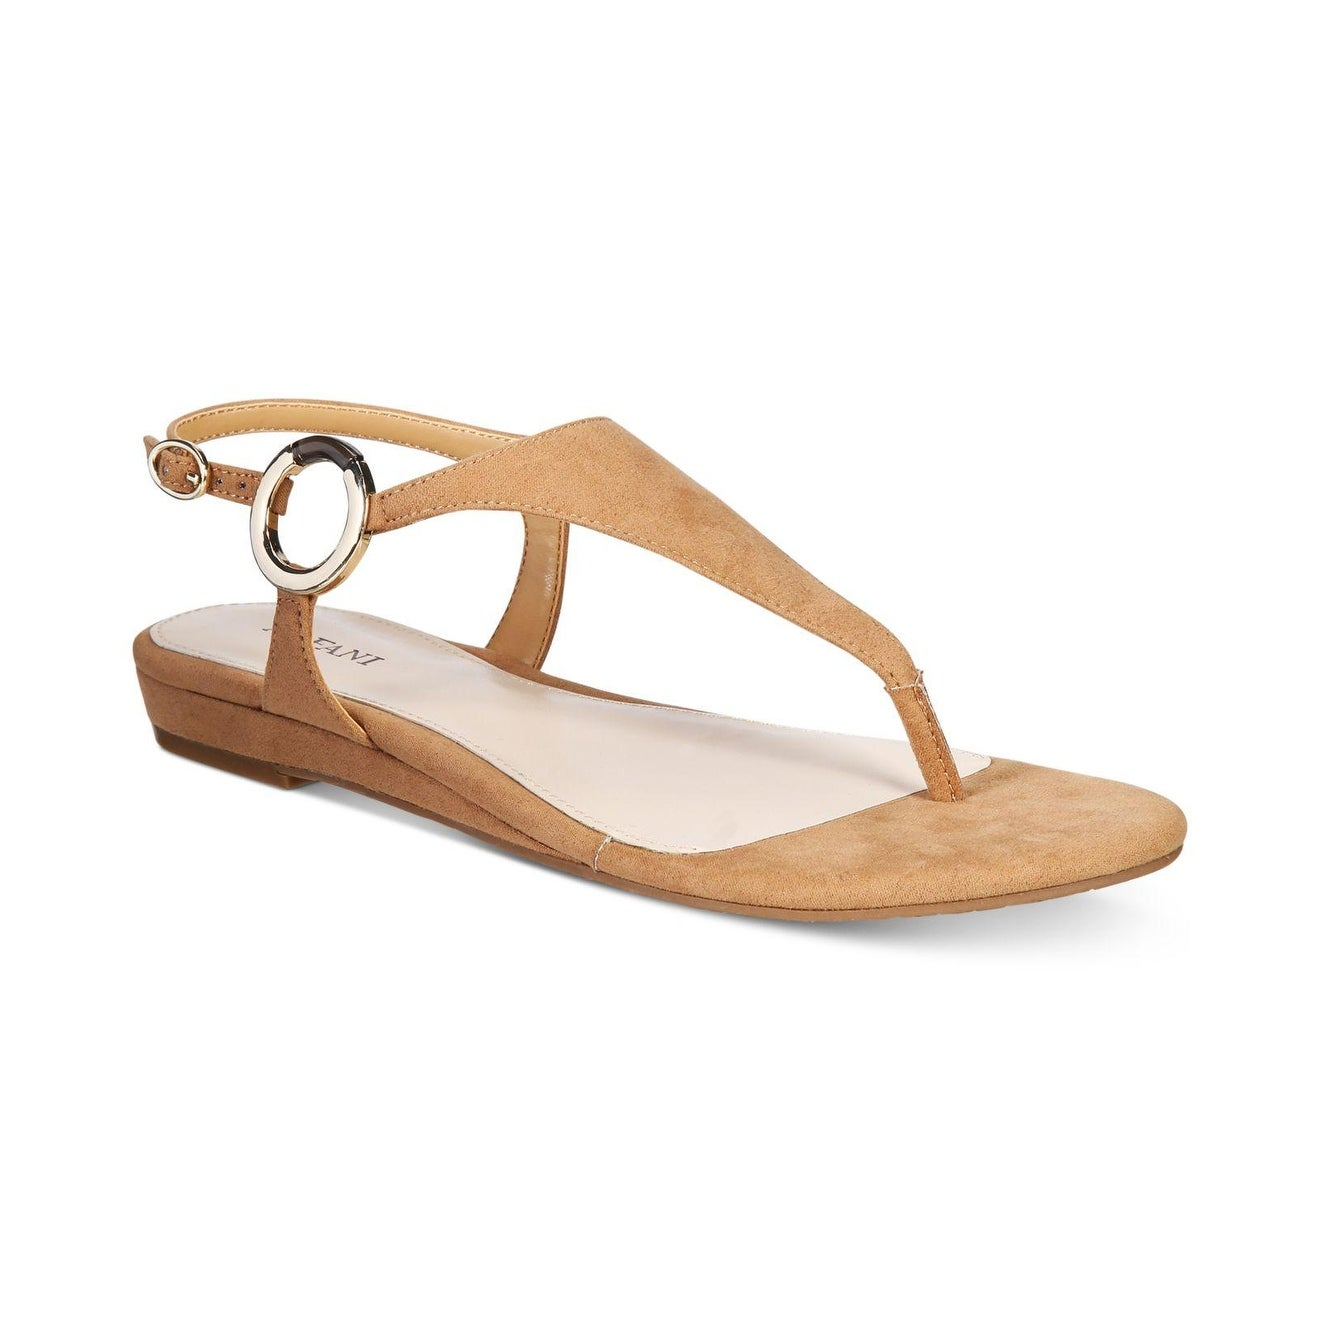 6fe84b0be6fb2 Shop Alfani Womens Honnee Open Toe Casual Ankle Strap Sandals - Free ...